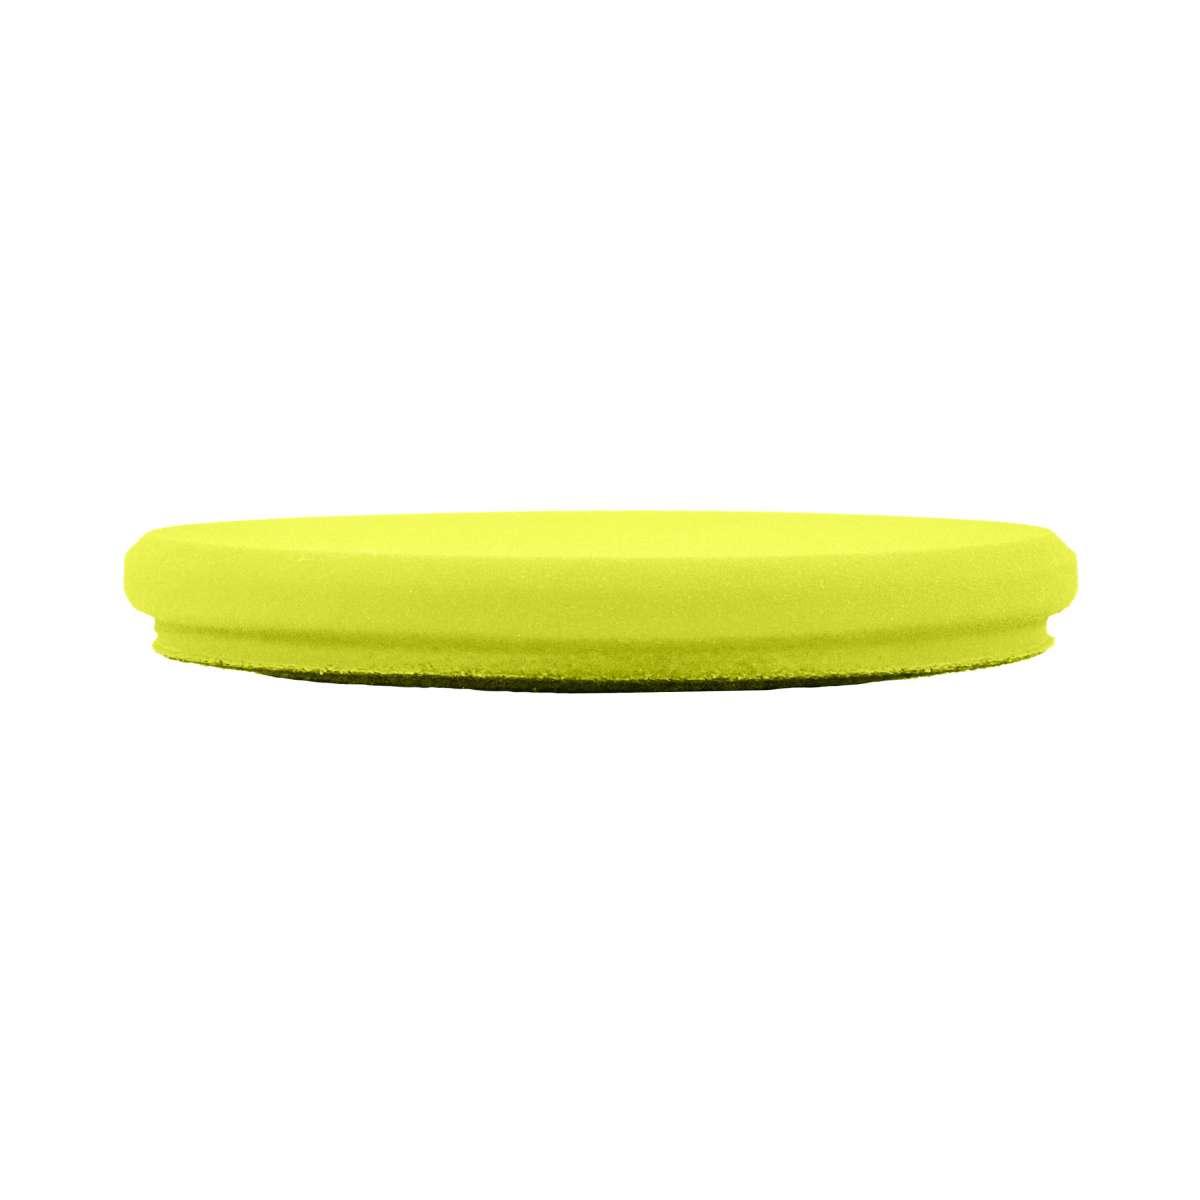 "Meguiar's Soft Buff Foam Polishing Disc 6"""